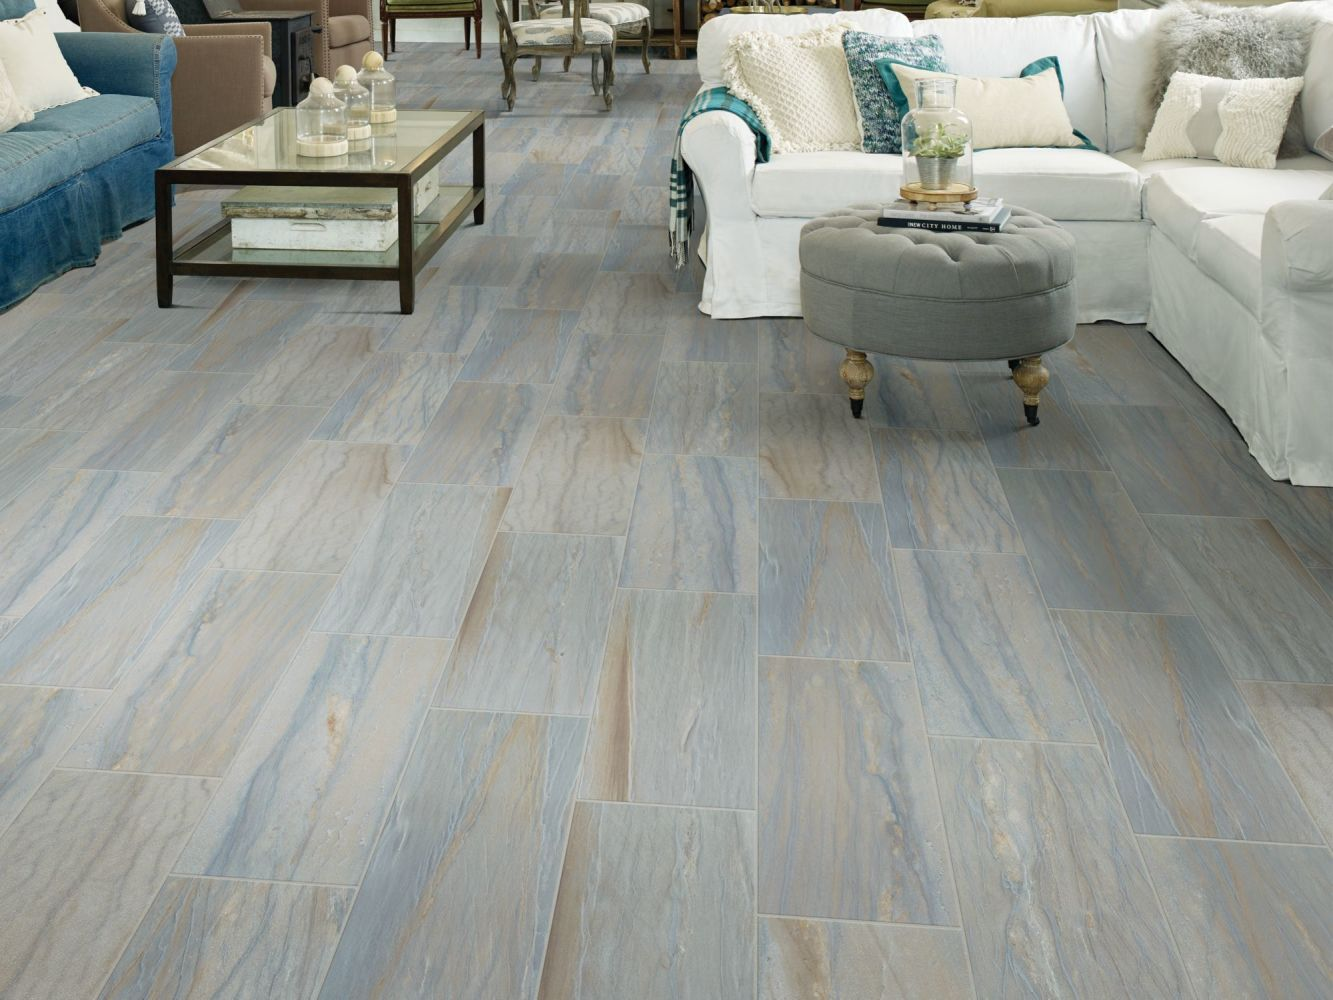 Shaw Floors Home Fn Gold Ceramic Tide Water Mosaic Azul 00450_TG76C